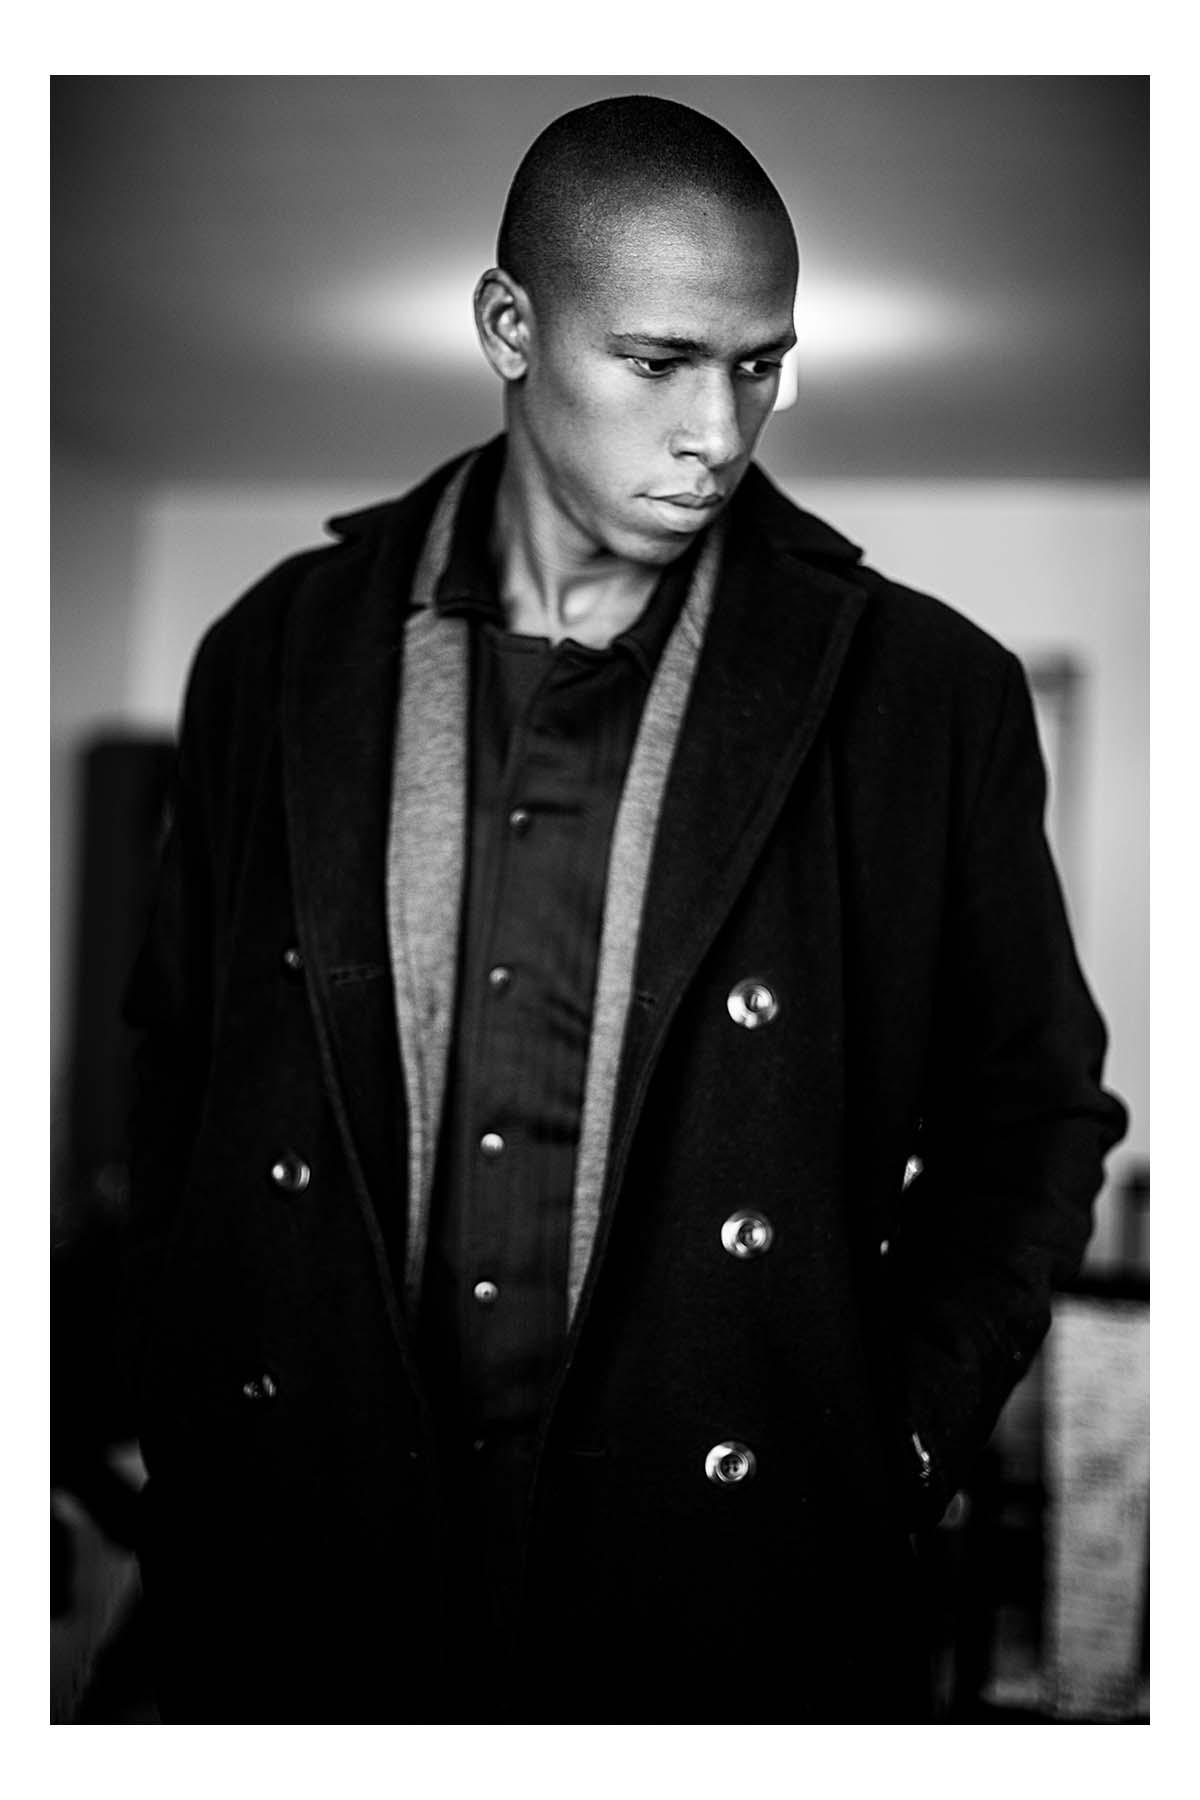 Vinicius Mendez by Ronaldo Gutierrez for Brazilian Male Model